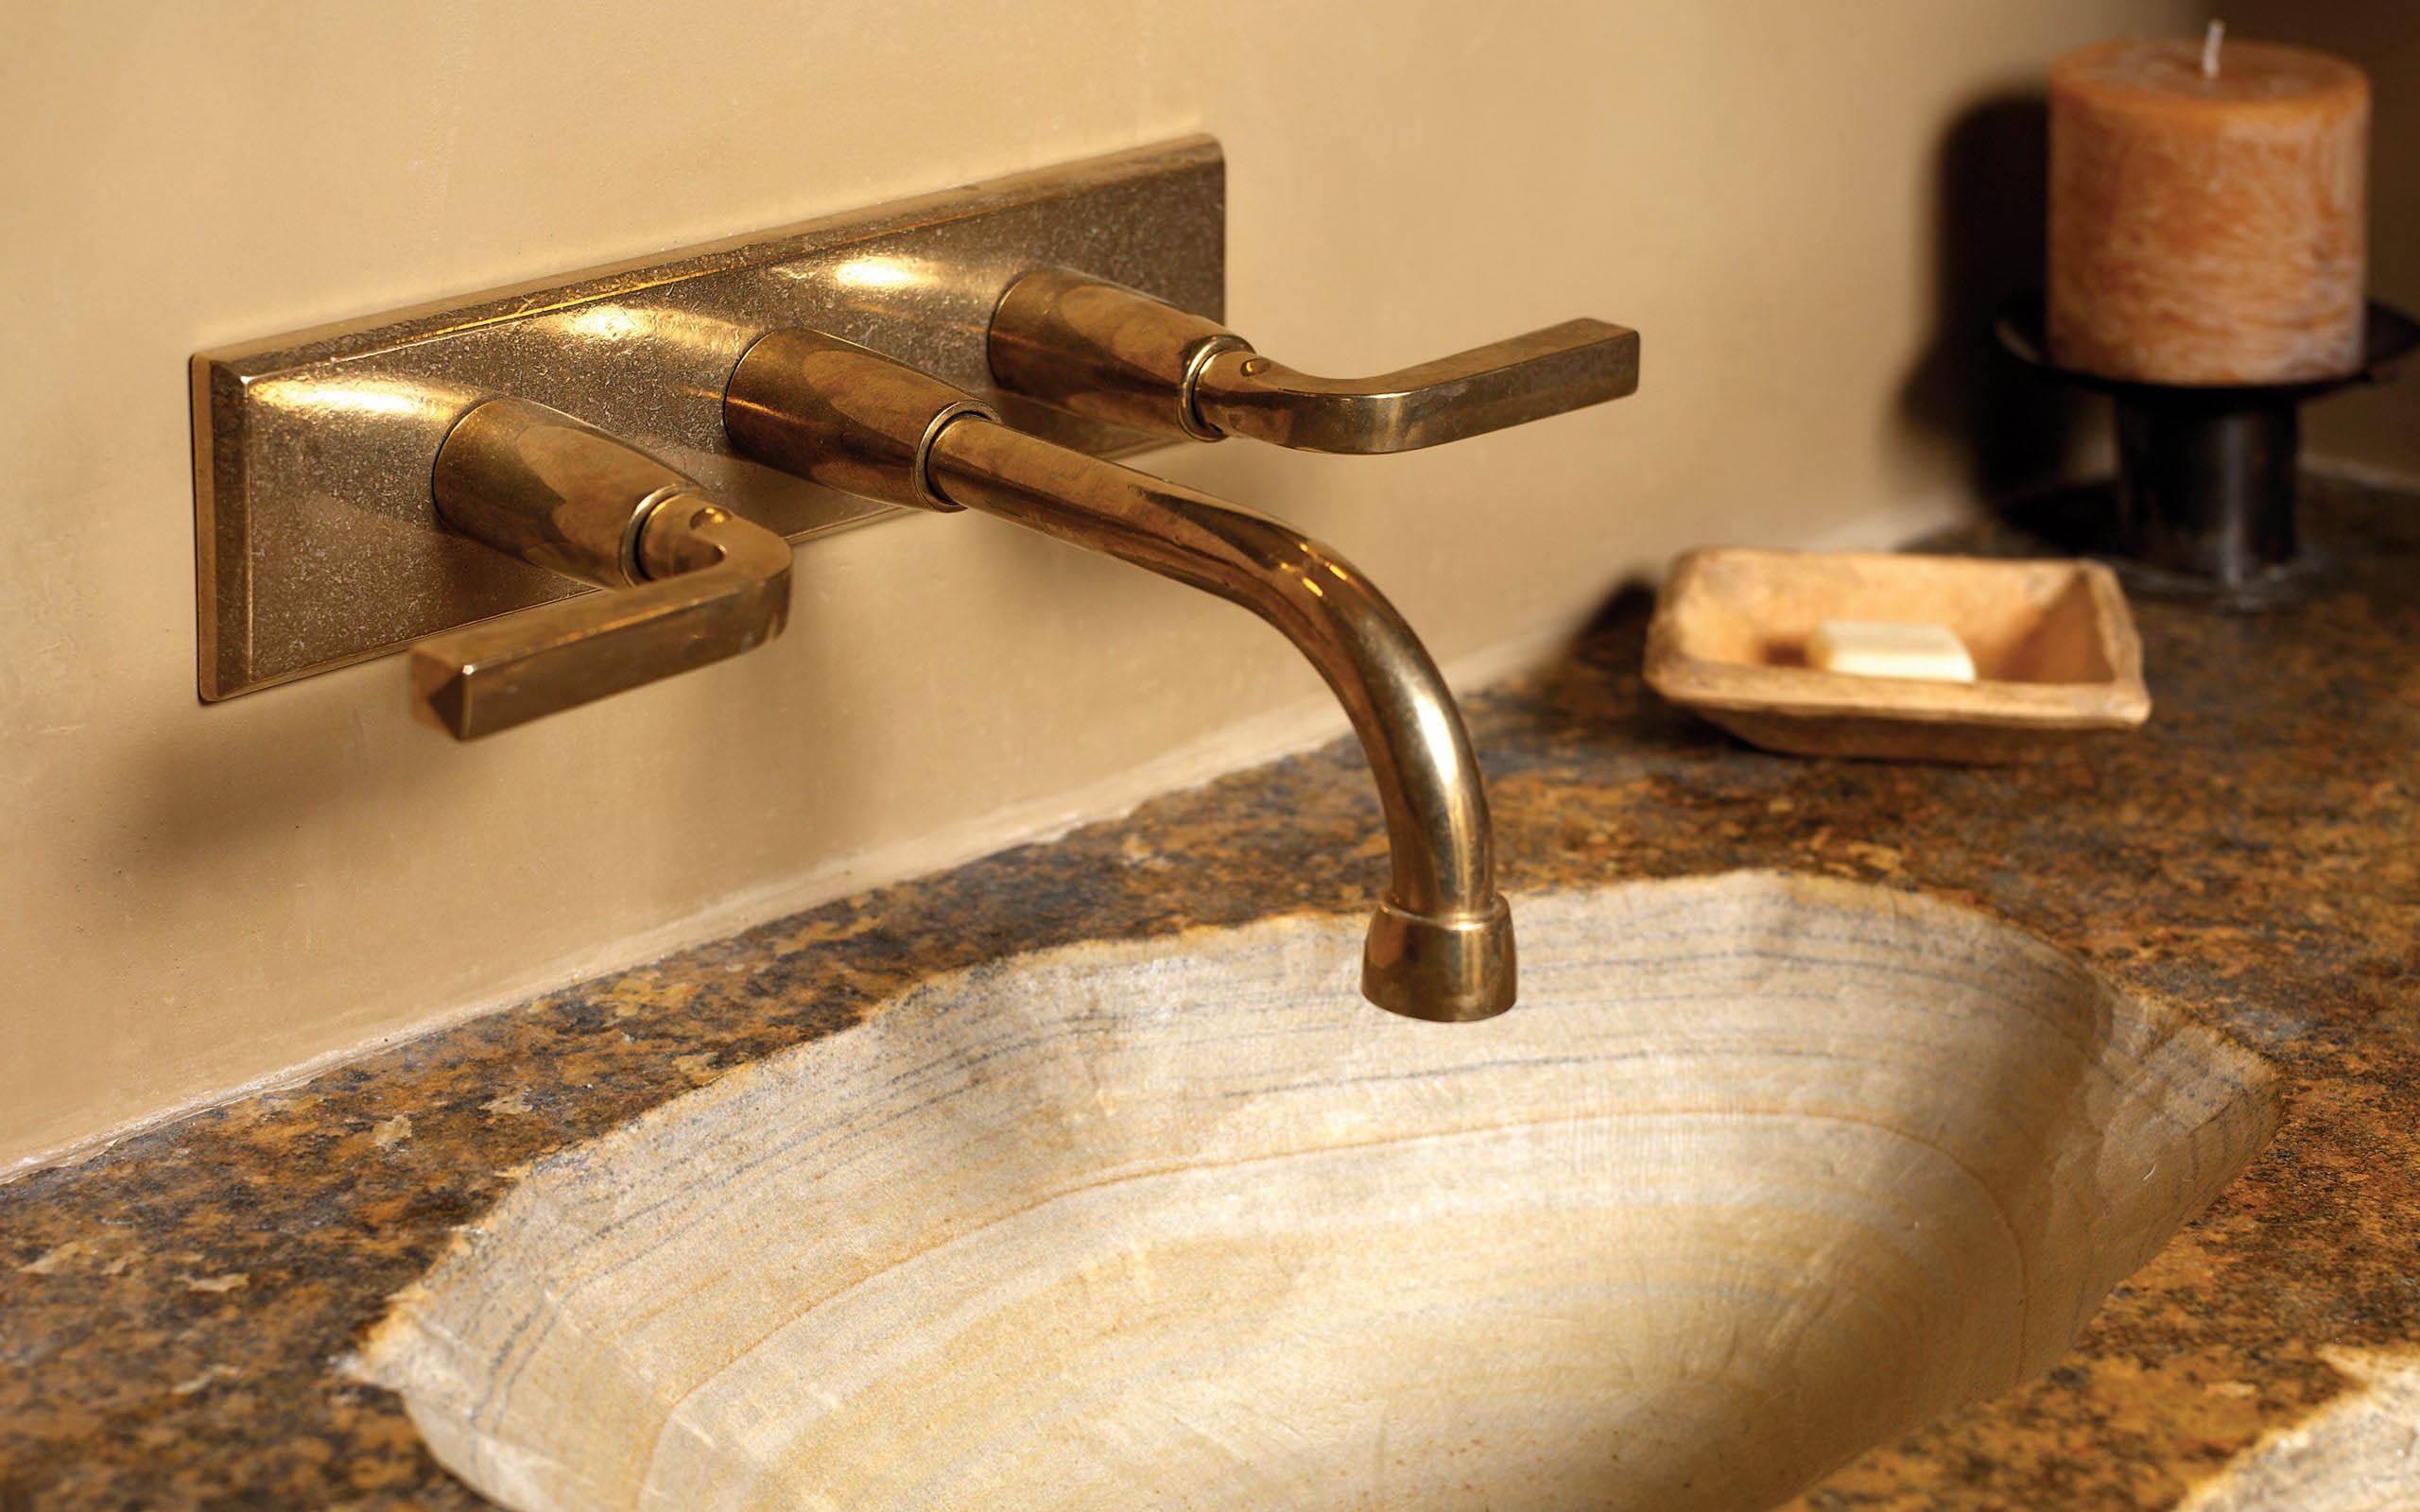 Wall Mount Faucet With Rectangular Escutcheon - design